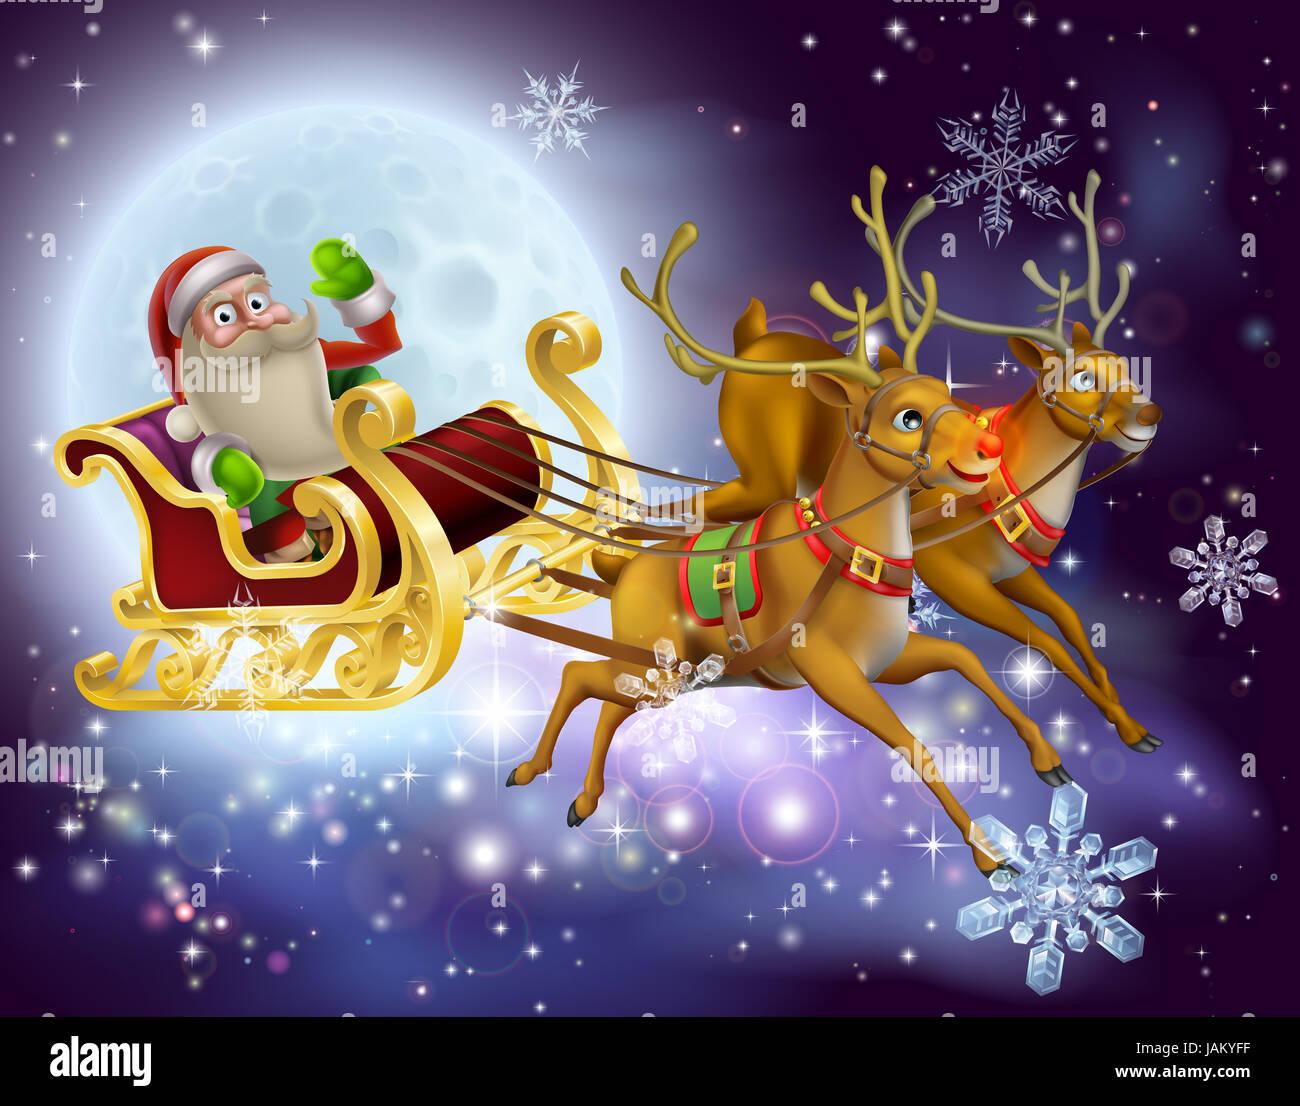 santa claus sleigh scene santa stockfotos santa claus. Black Bedroom Furniture Sets. Home Design Ideas